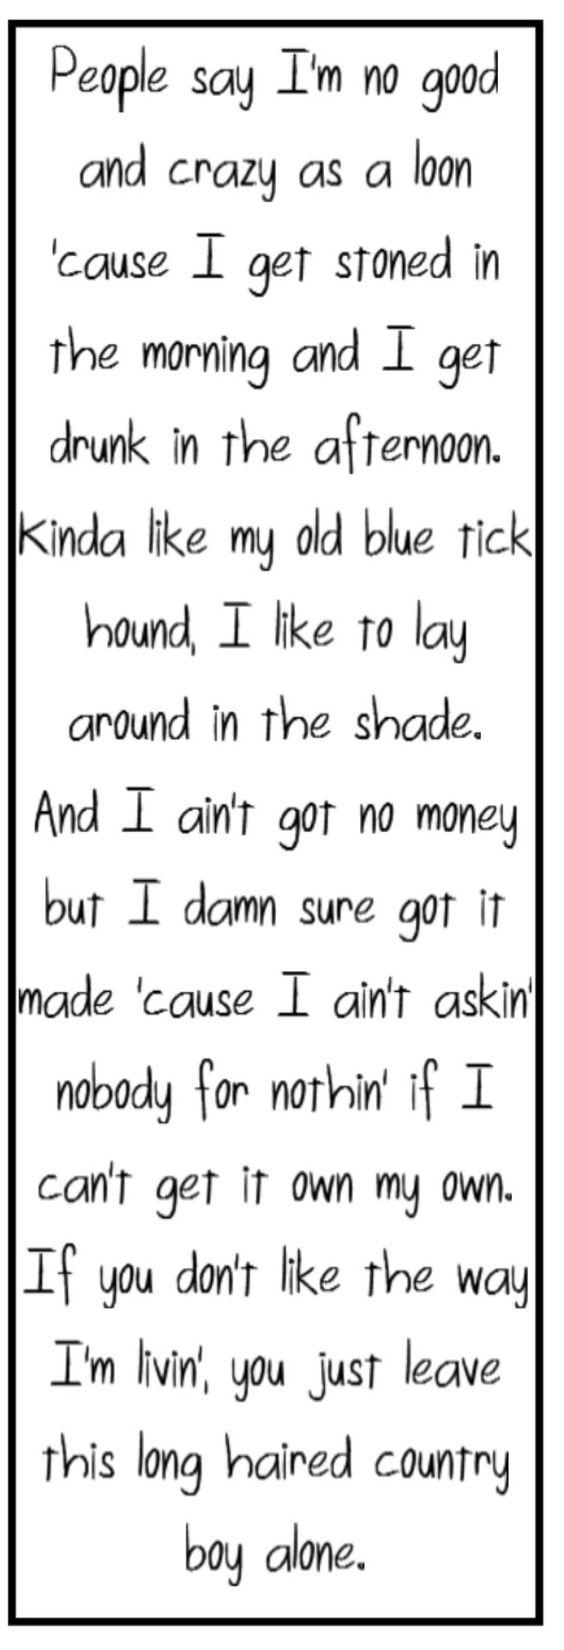 The Charlie Daniels Band - Long Haired Country Boy song lyrics, music. 2014 KY bigomusicfest.com